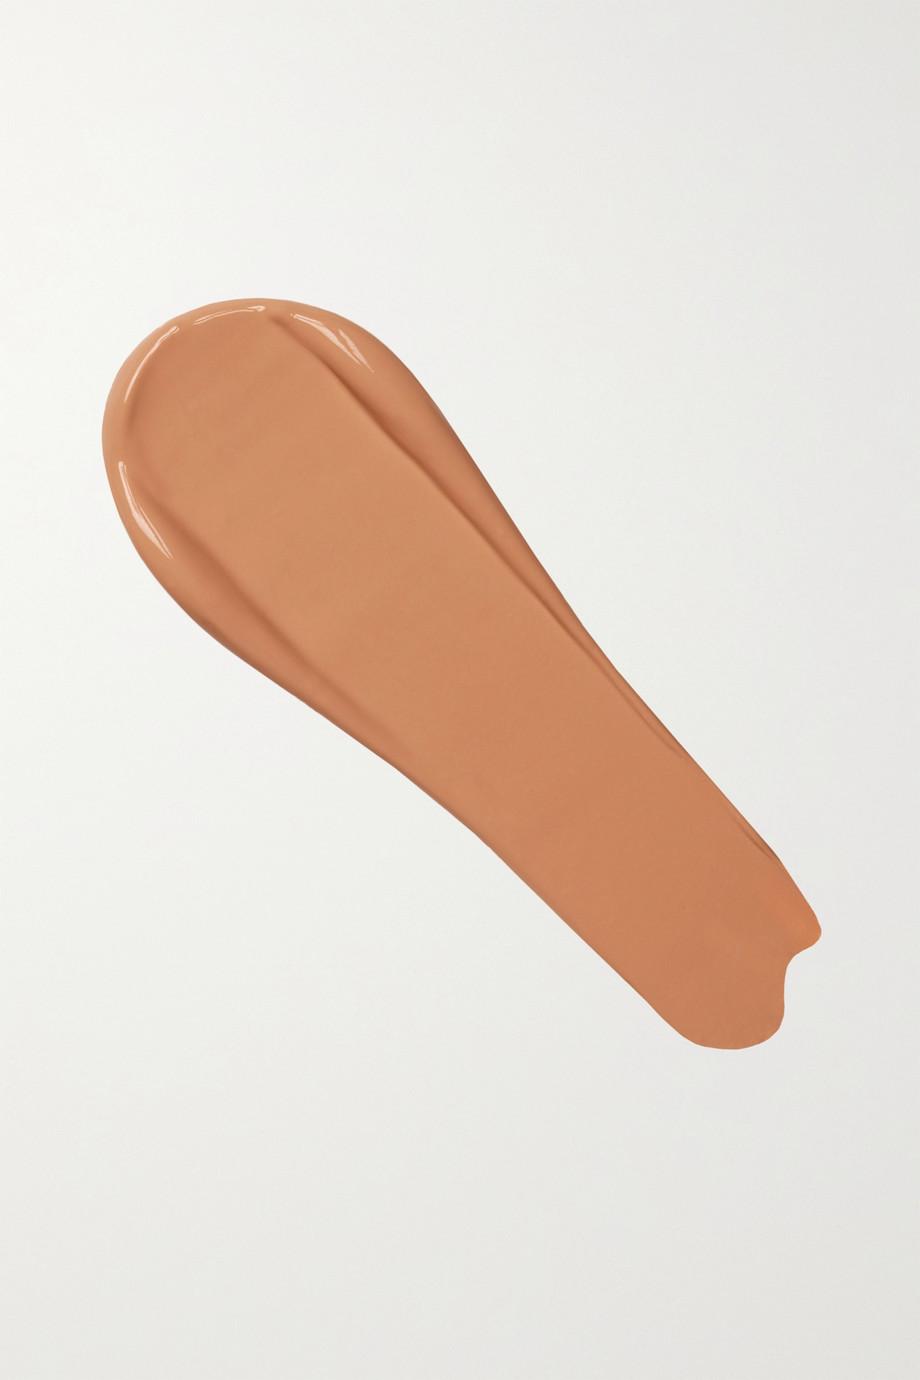 Pat McGrath Labs Skin Fetish: Sublime Perfection Concealer - M18, 5ml